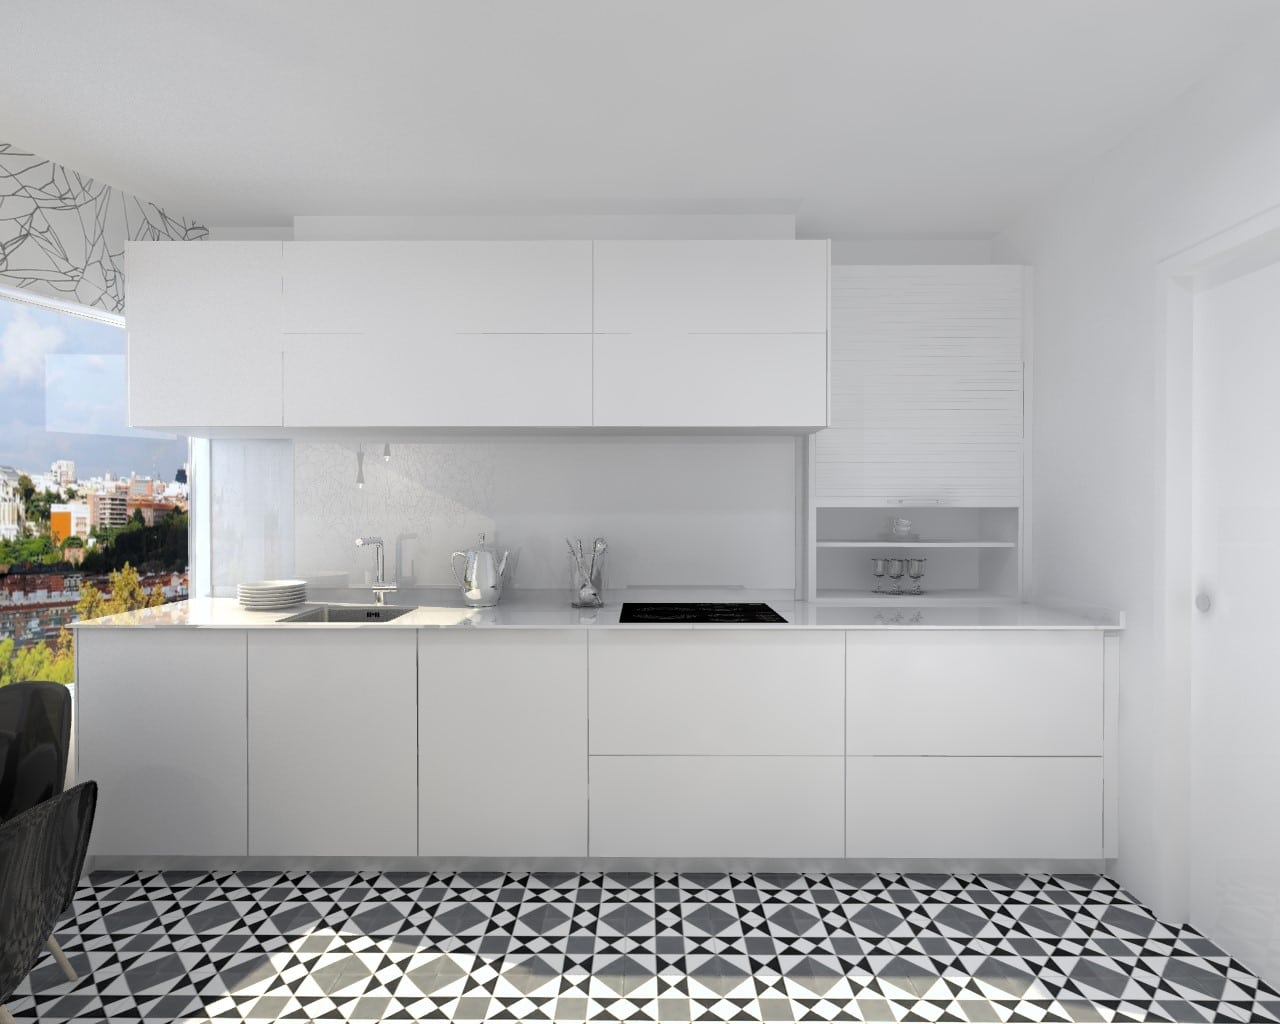 Cocina santos line e blanco sapporo seda estudio cocinas dc - Cocinas santos valencia ...